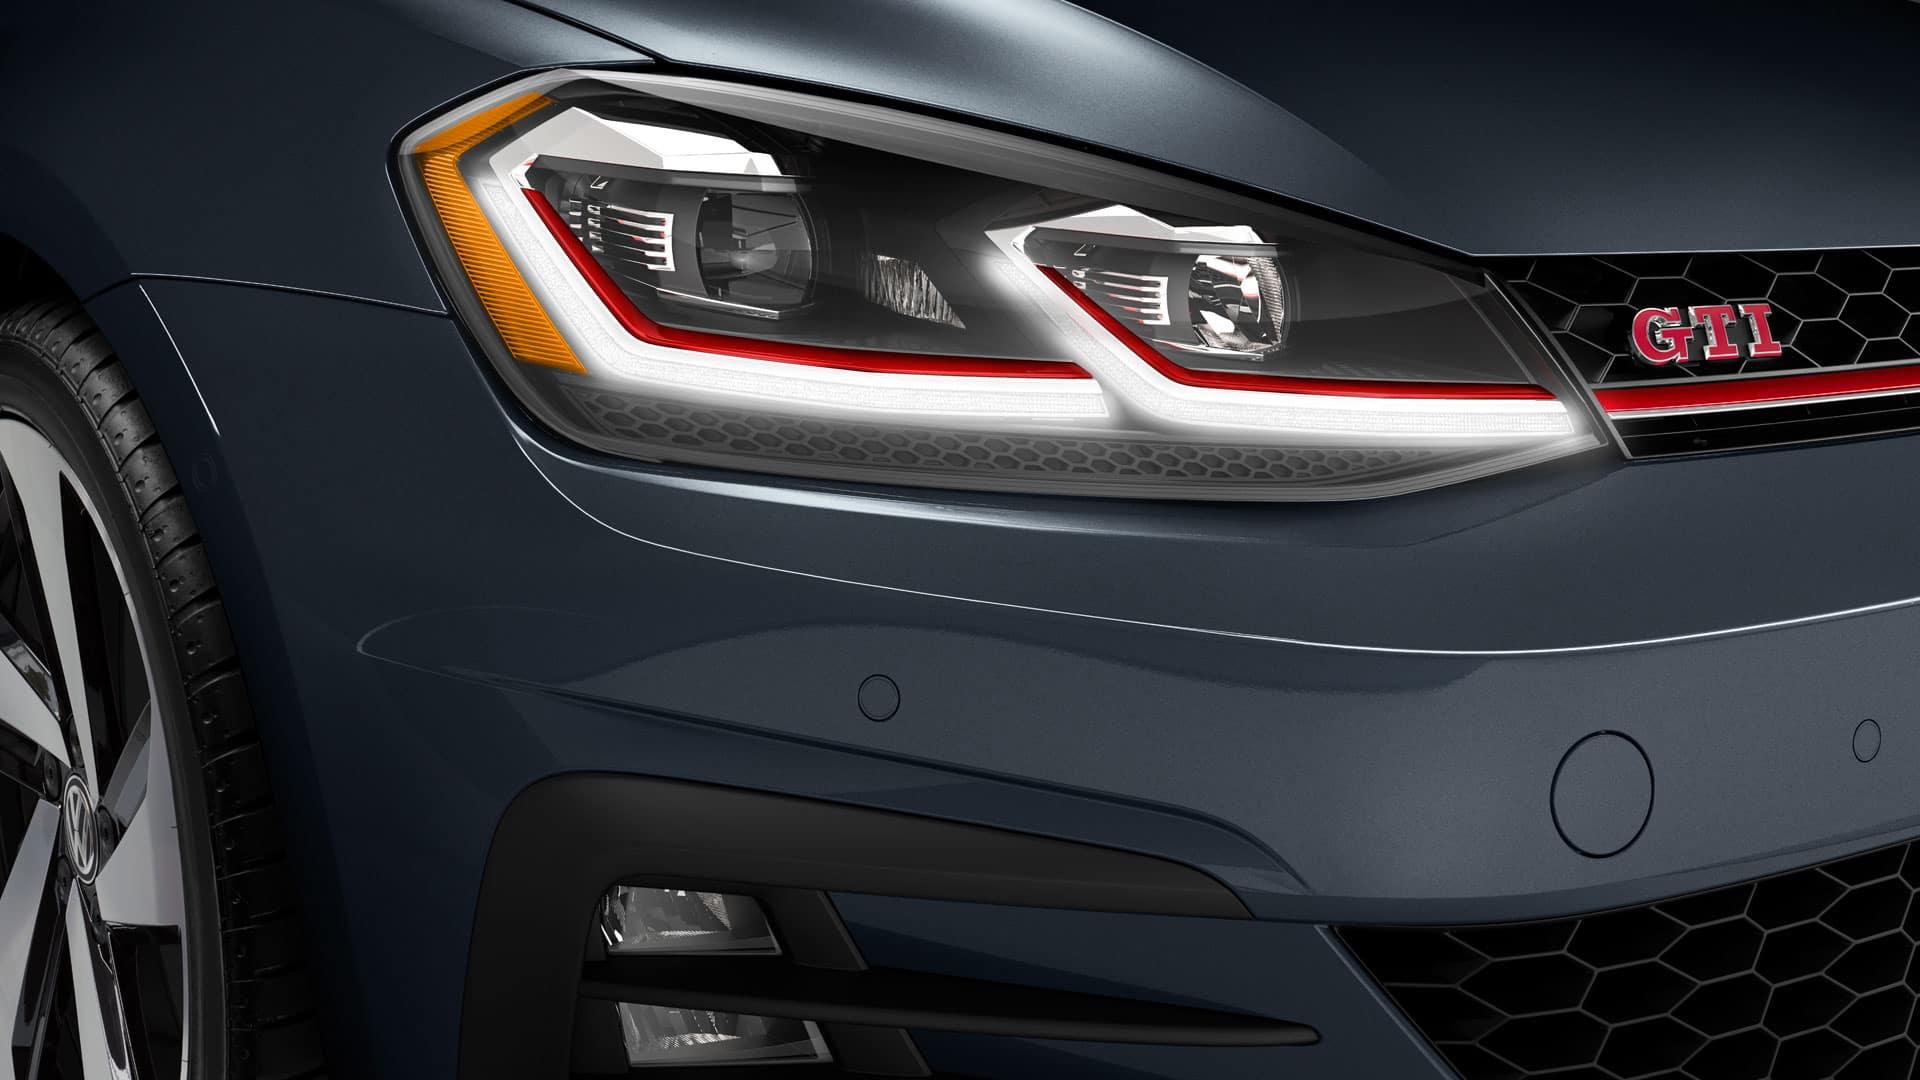 2019 VW Golf GTI LED headlights